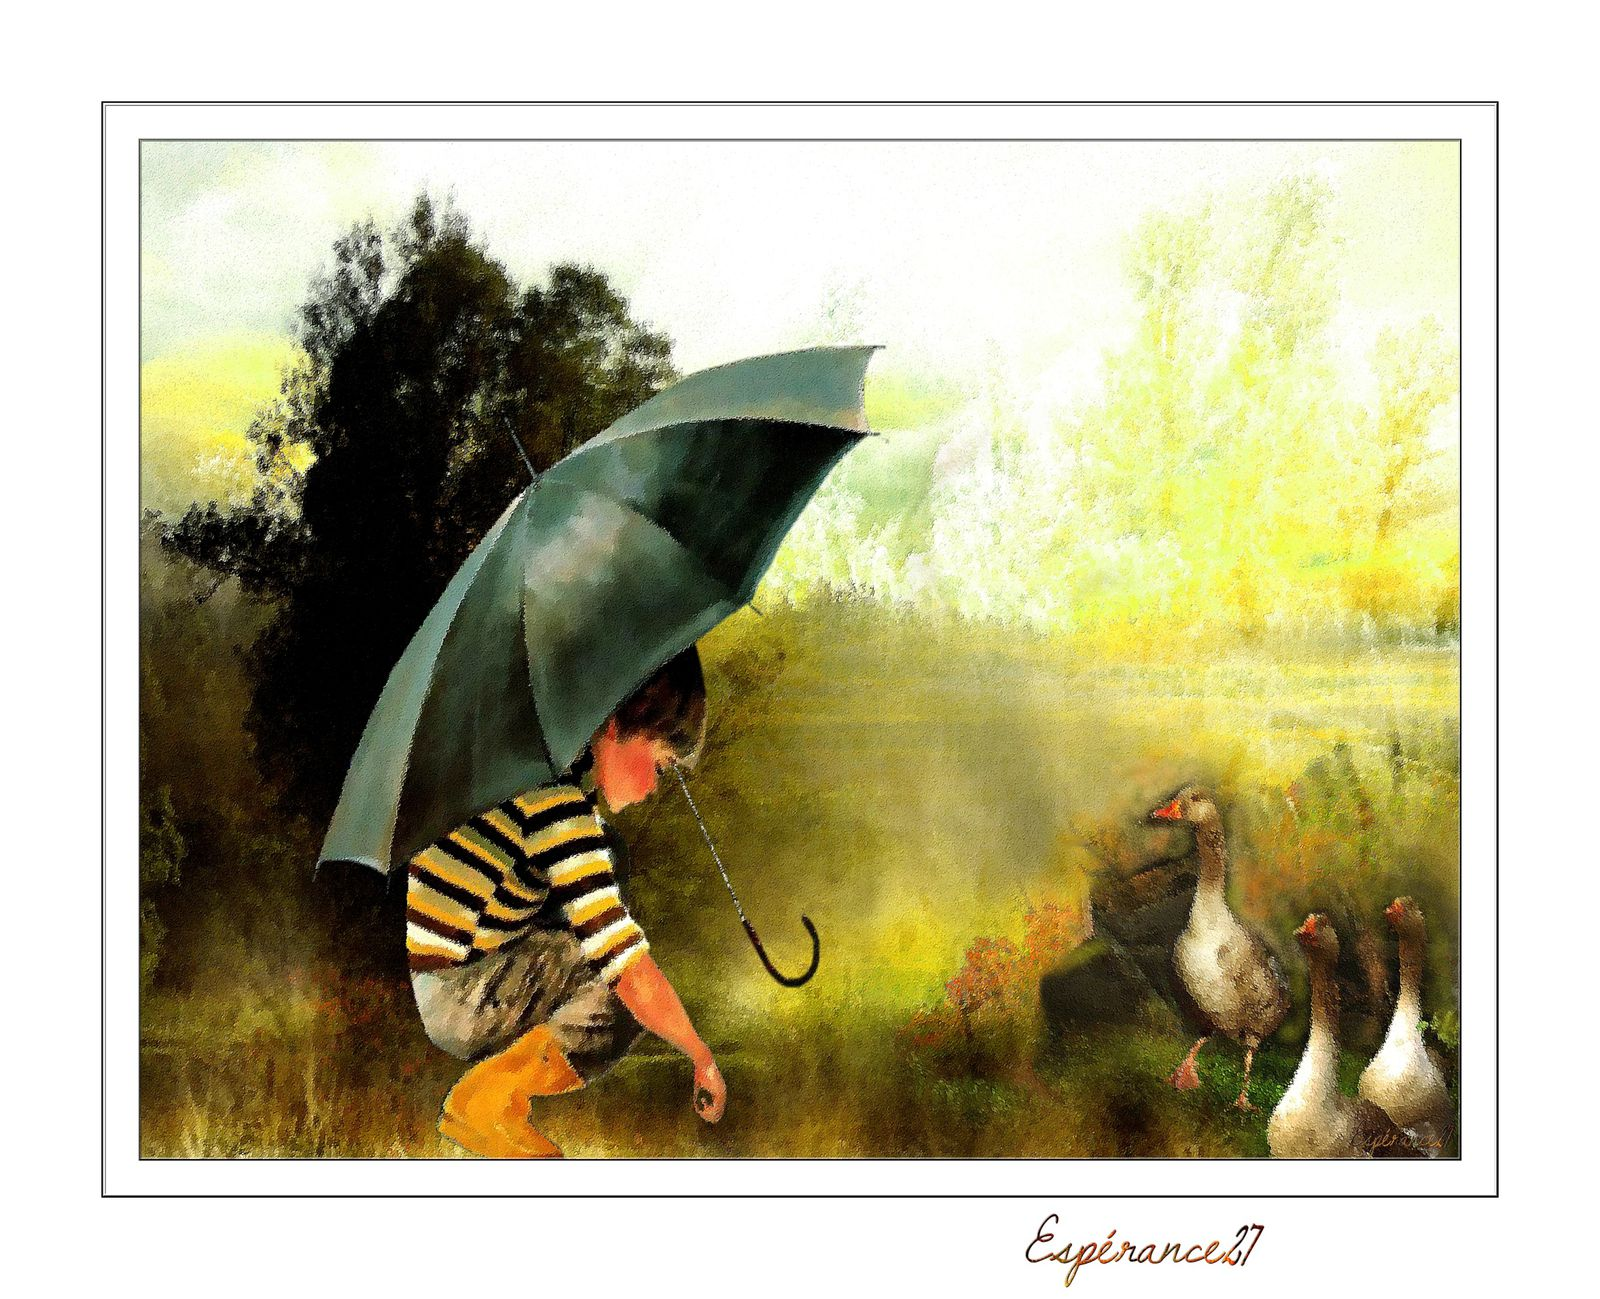 http://idata.over-blog.com/3/91/86/55/TENDRESSE/COULEUR-AFRICAINE/AMOUR/STYLE-PEINTURE-VIRTUELLE/style-peinture-virtuelle/1691.jpg